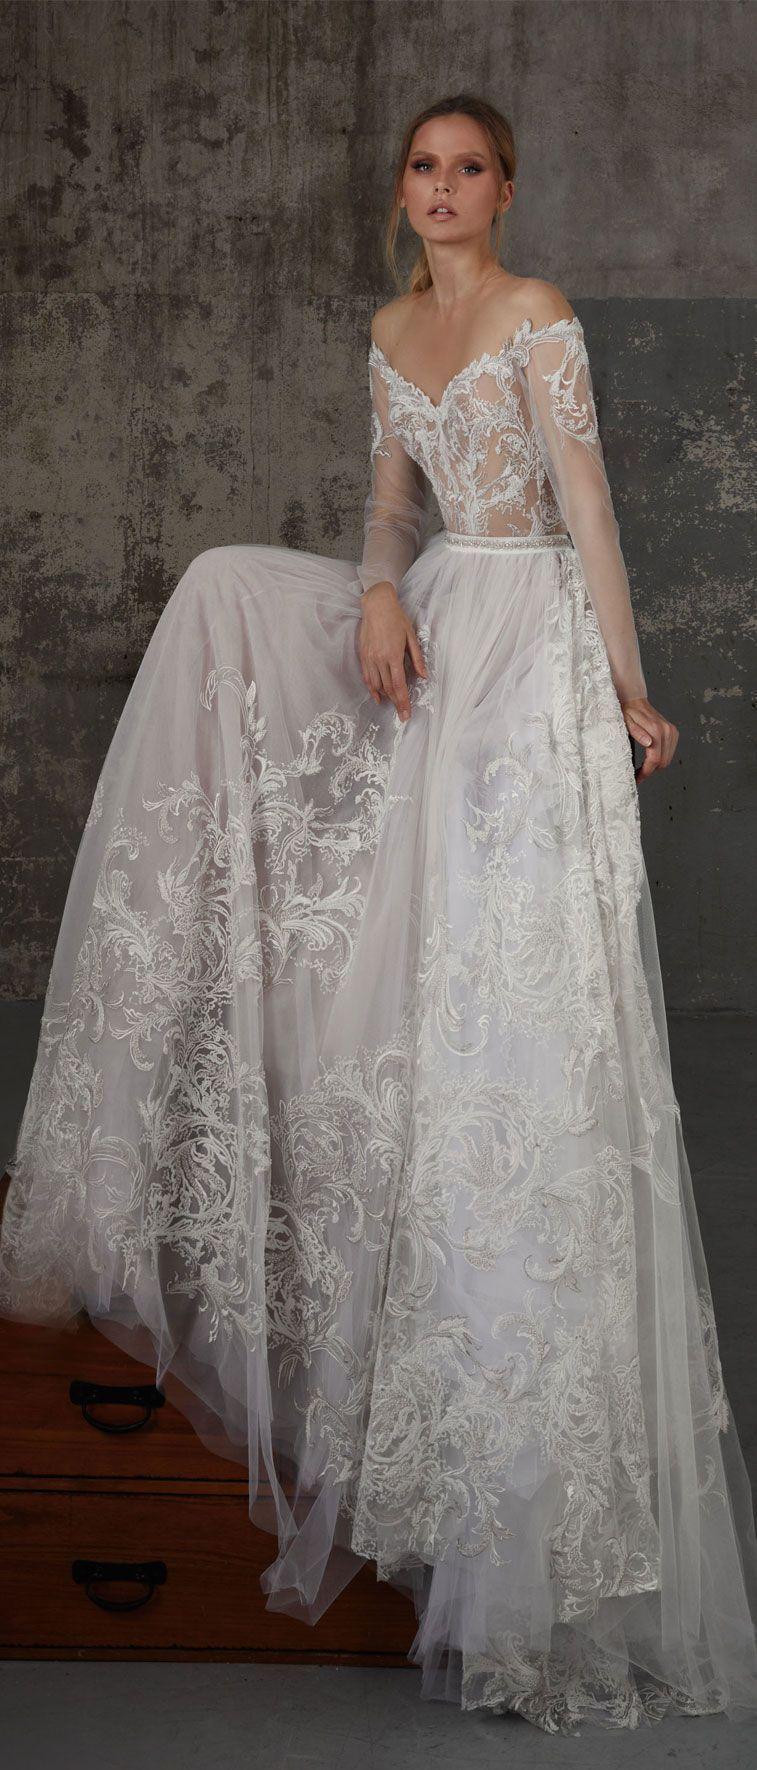 Off the shoulder long sleeves wedding dress boho wedding dress